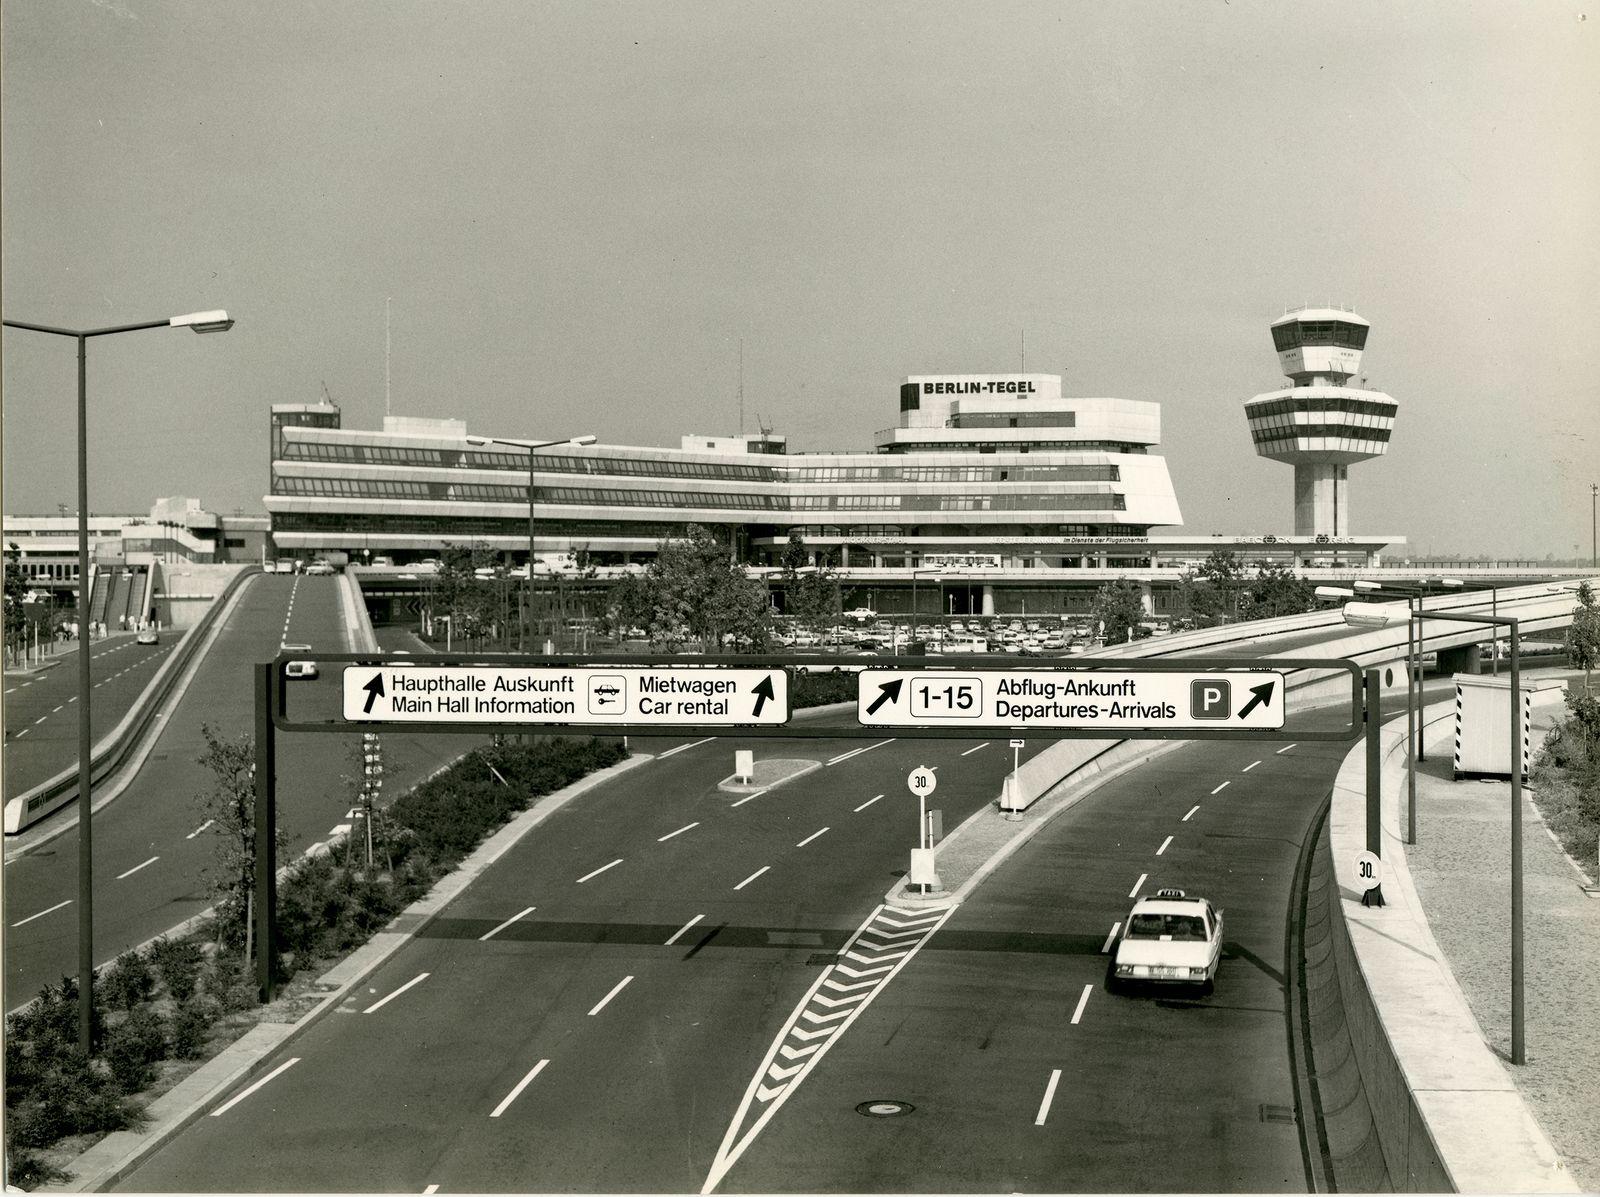 BUCH TXL. Berlin Tegel Airport / Drive to Your Gate / Seite 10-11, Bild 4